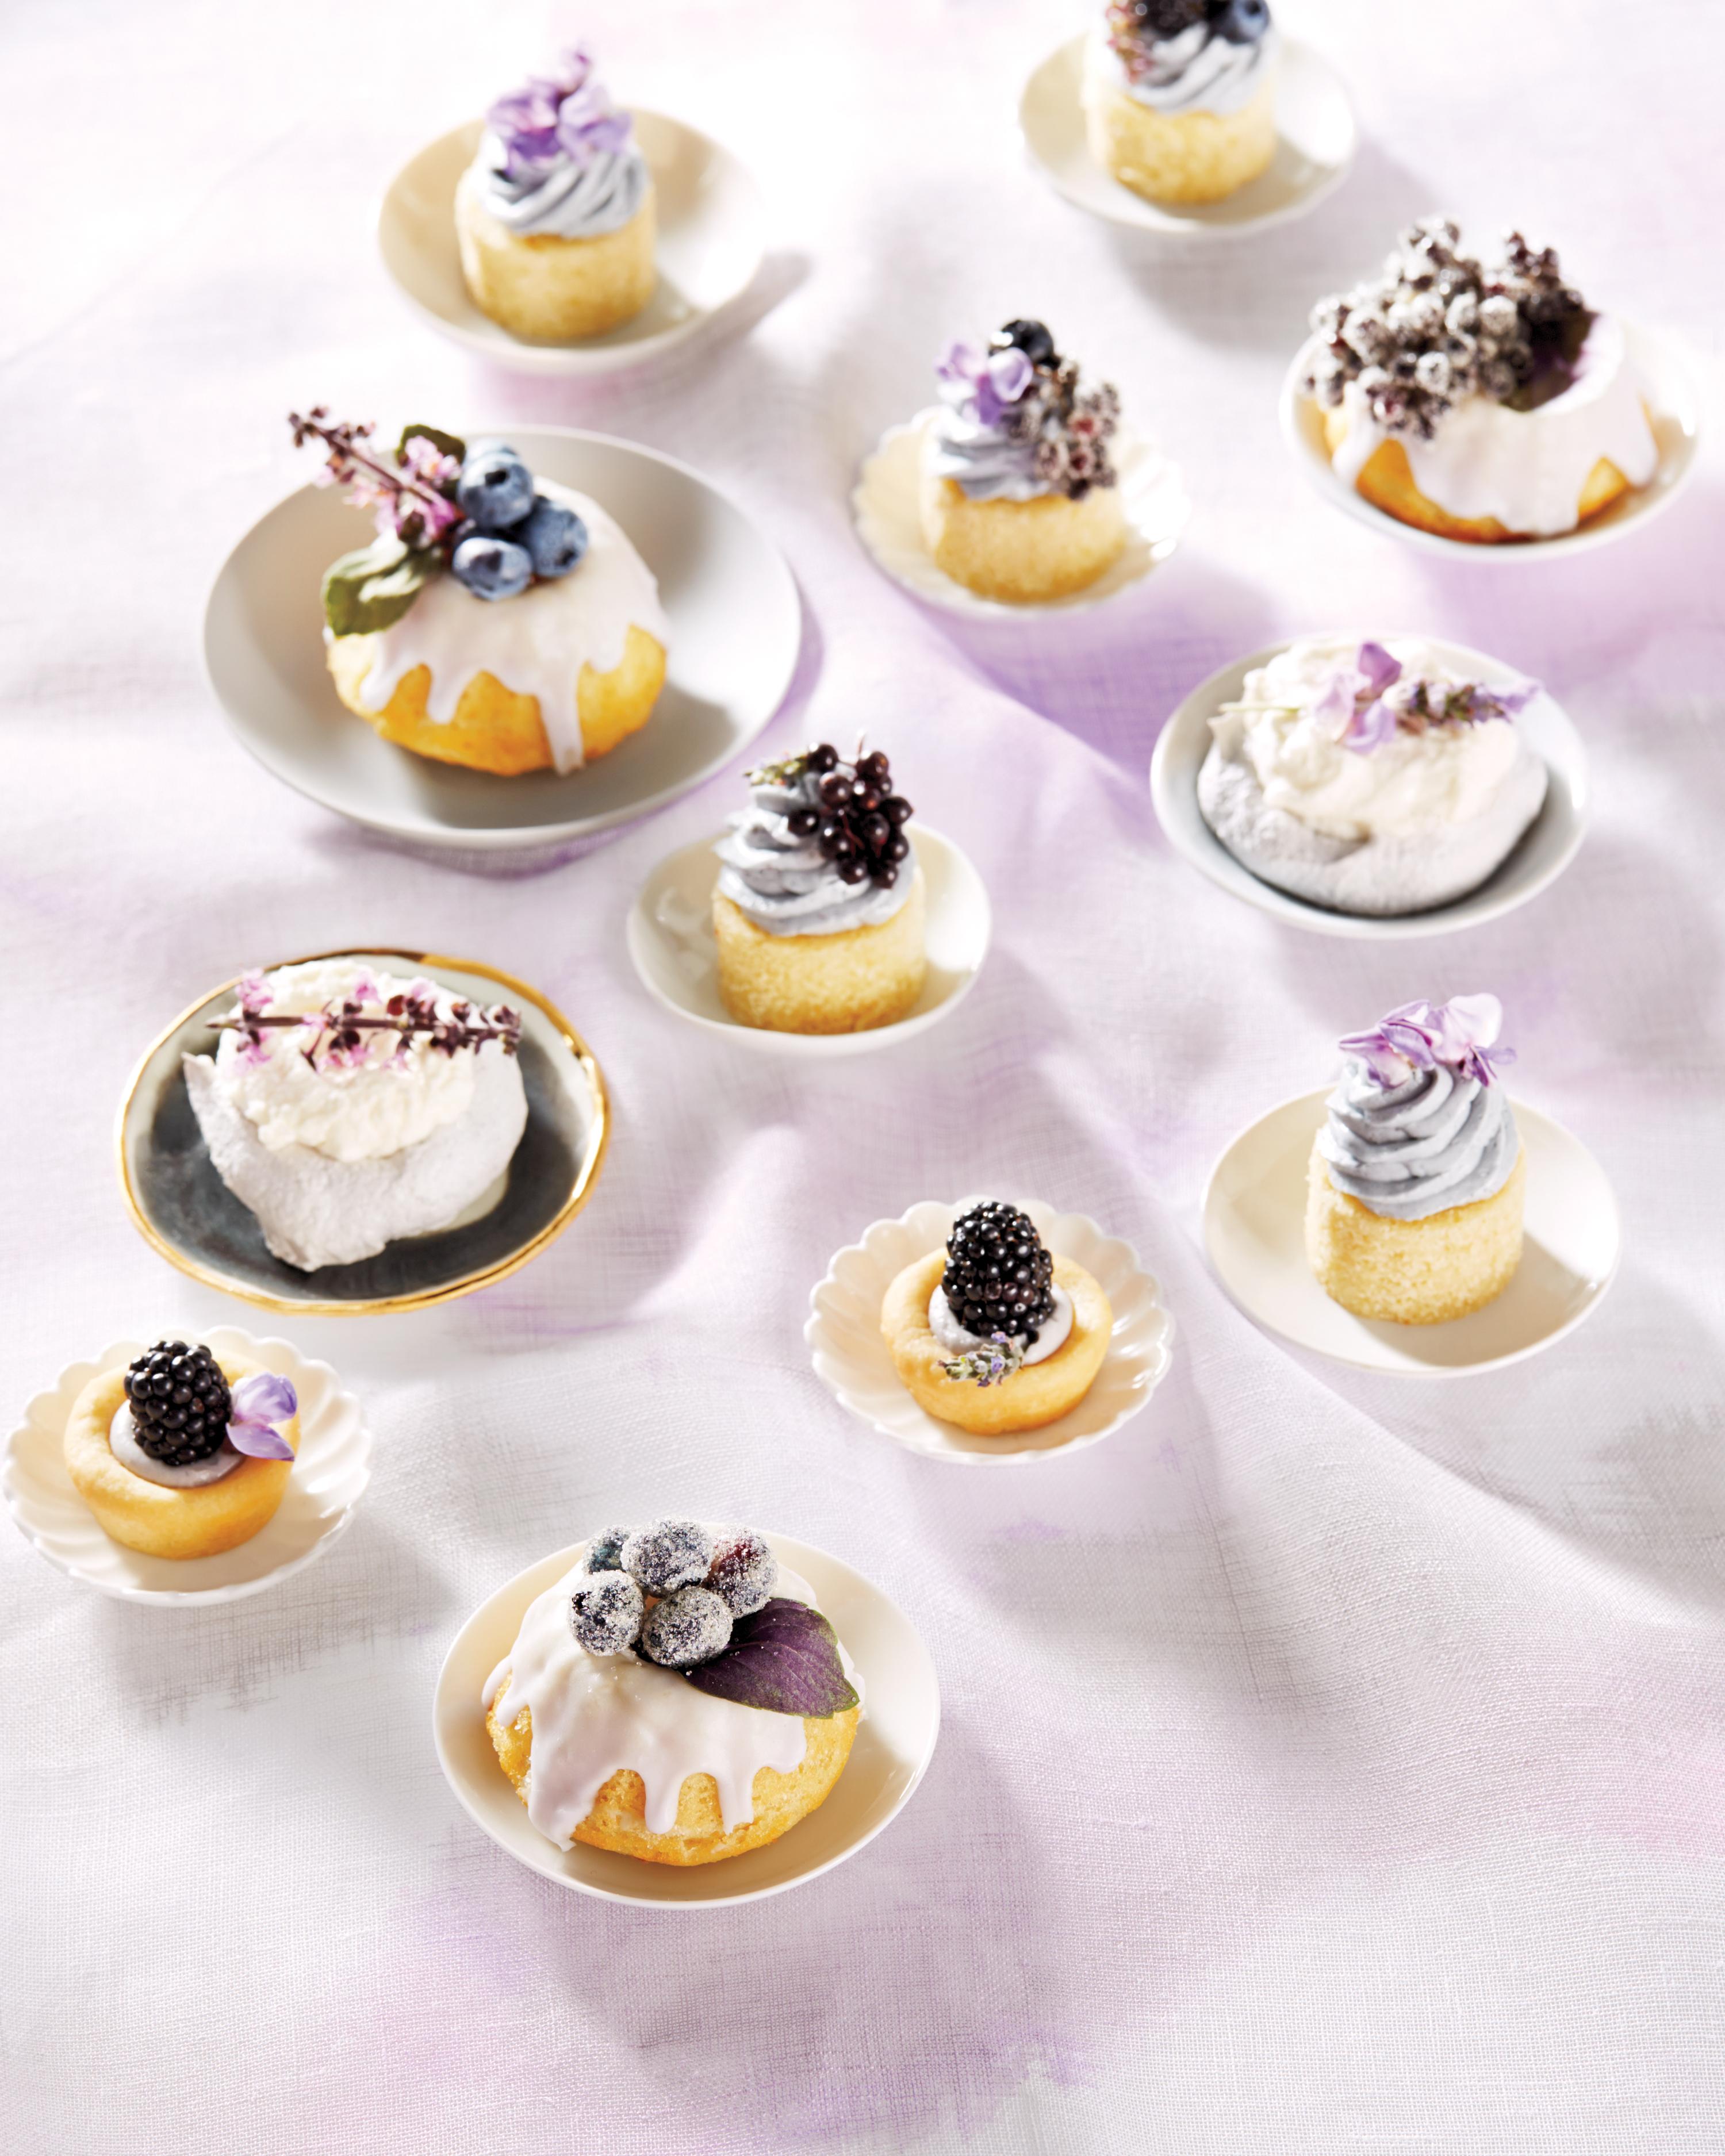 desserts-fb-114-d112421.jpg